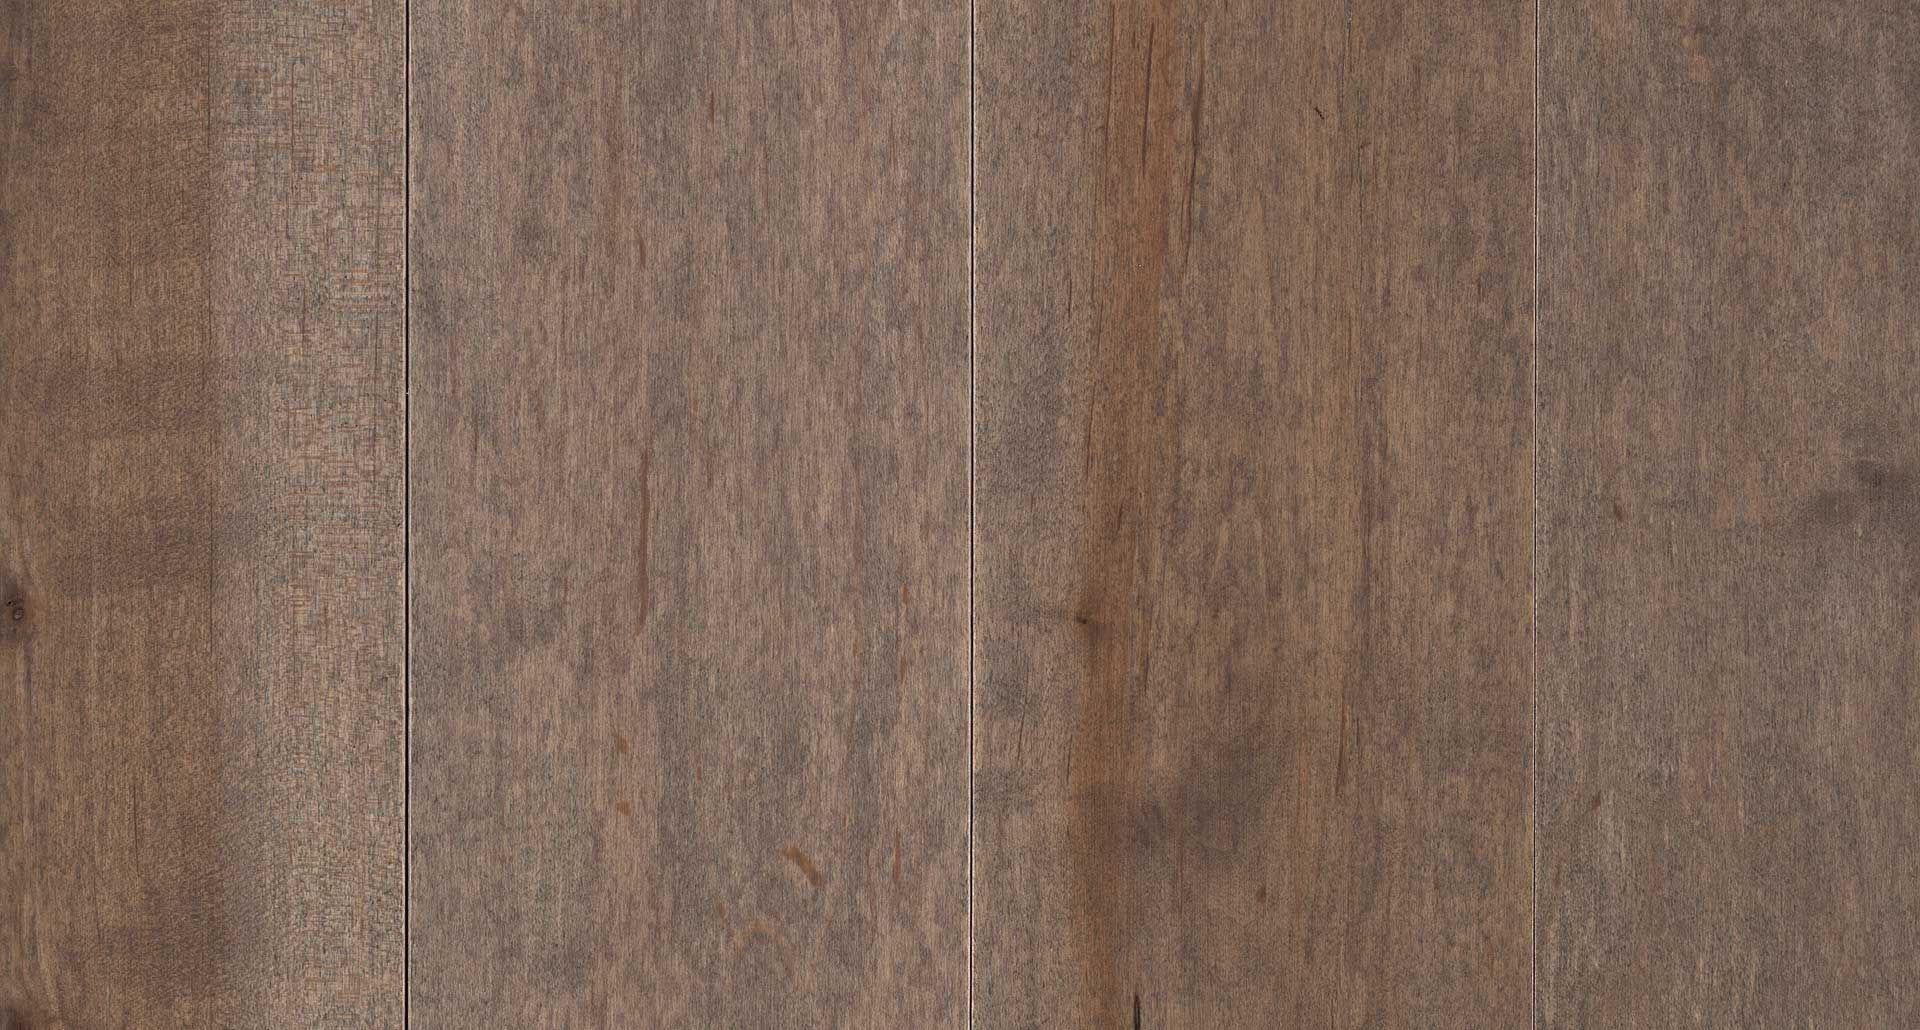 Flint Maple Pergo American Era Solid Hardwood Flooring